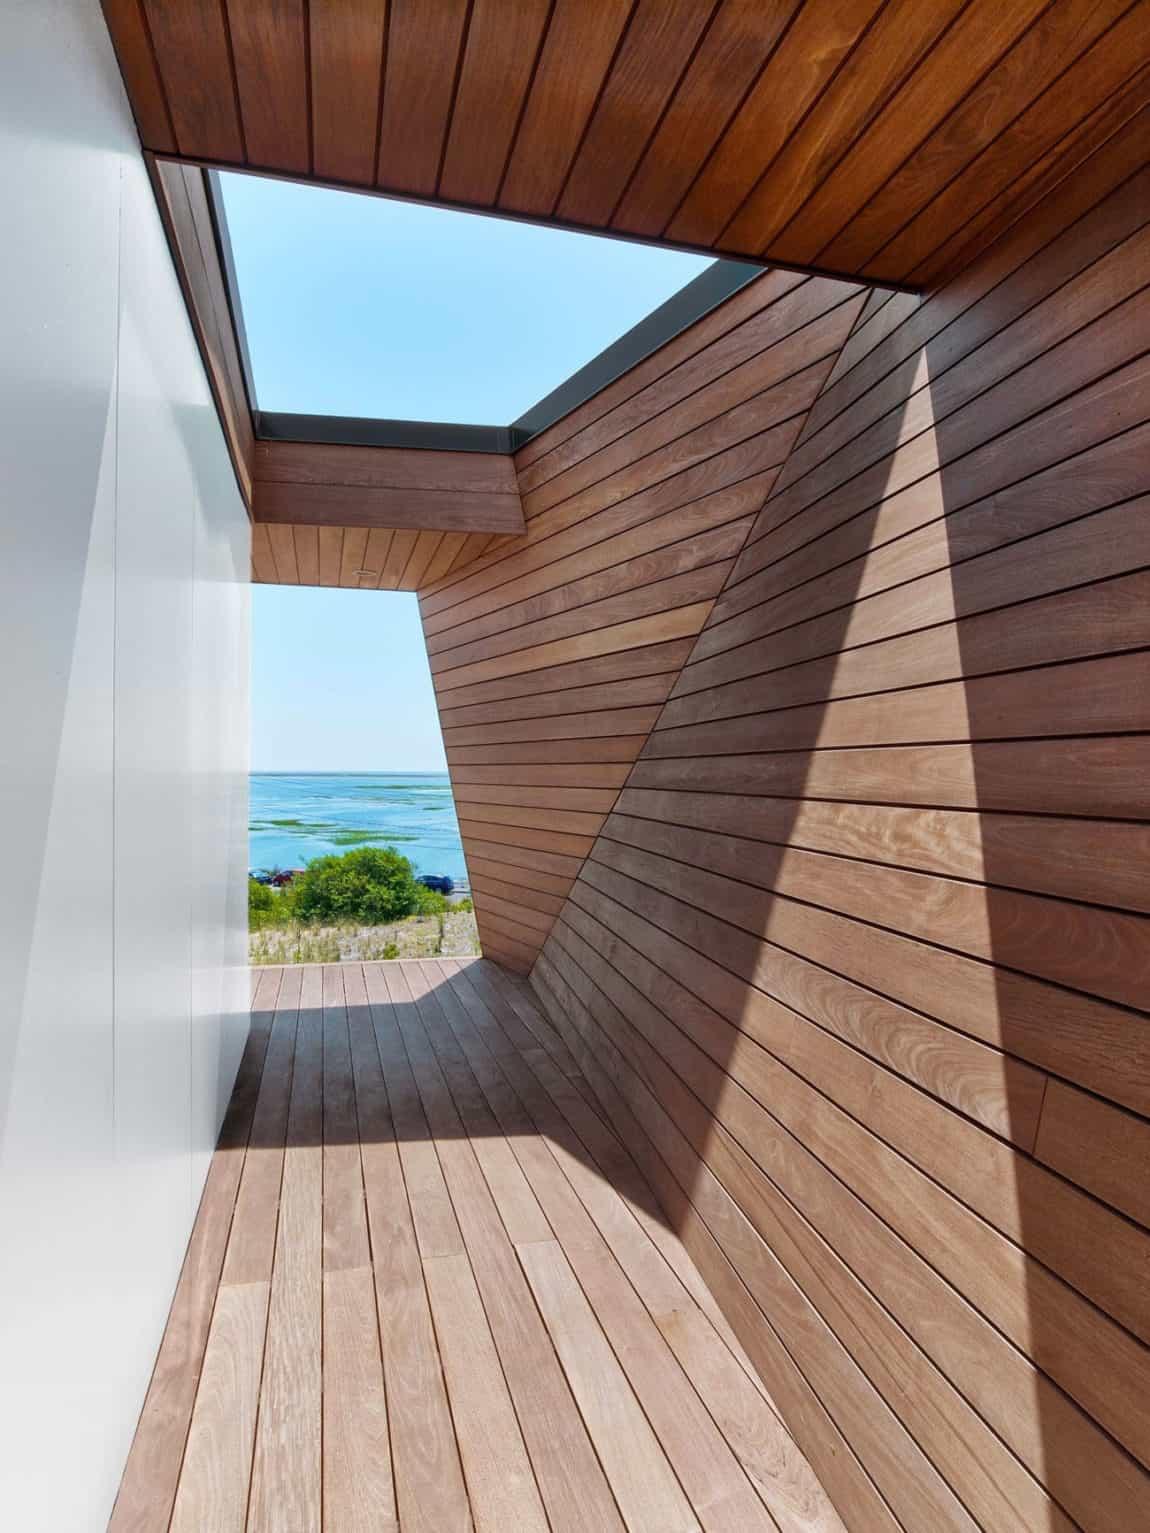 Cape Cod Beach House by Hariri & Hariri Architecture (6)